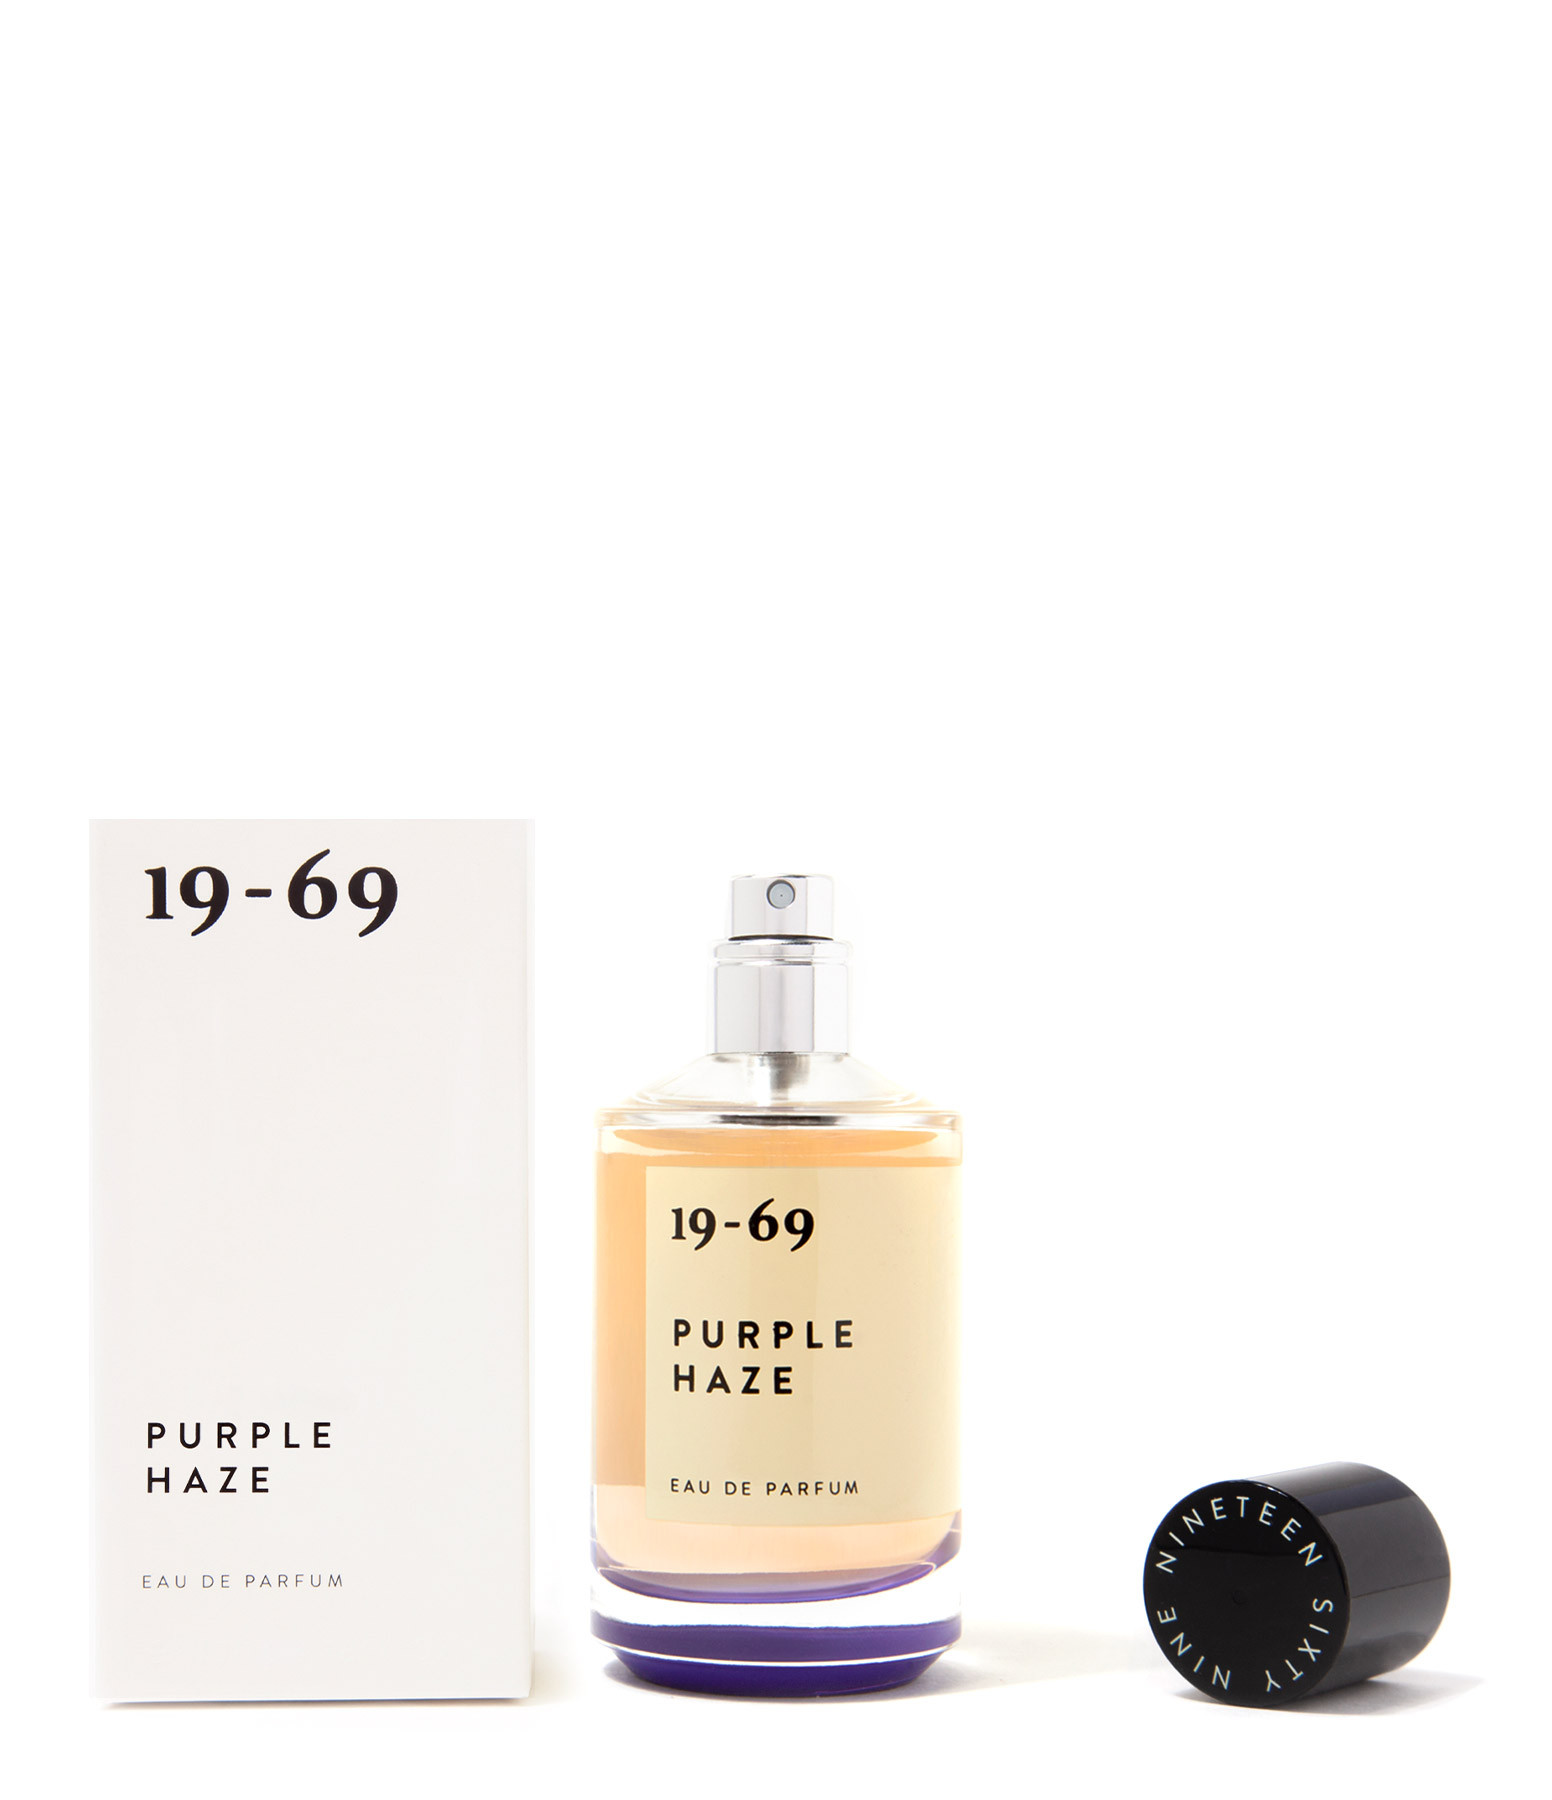 19-69 - Eau de Parfum Purple Haze 100 ml